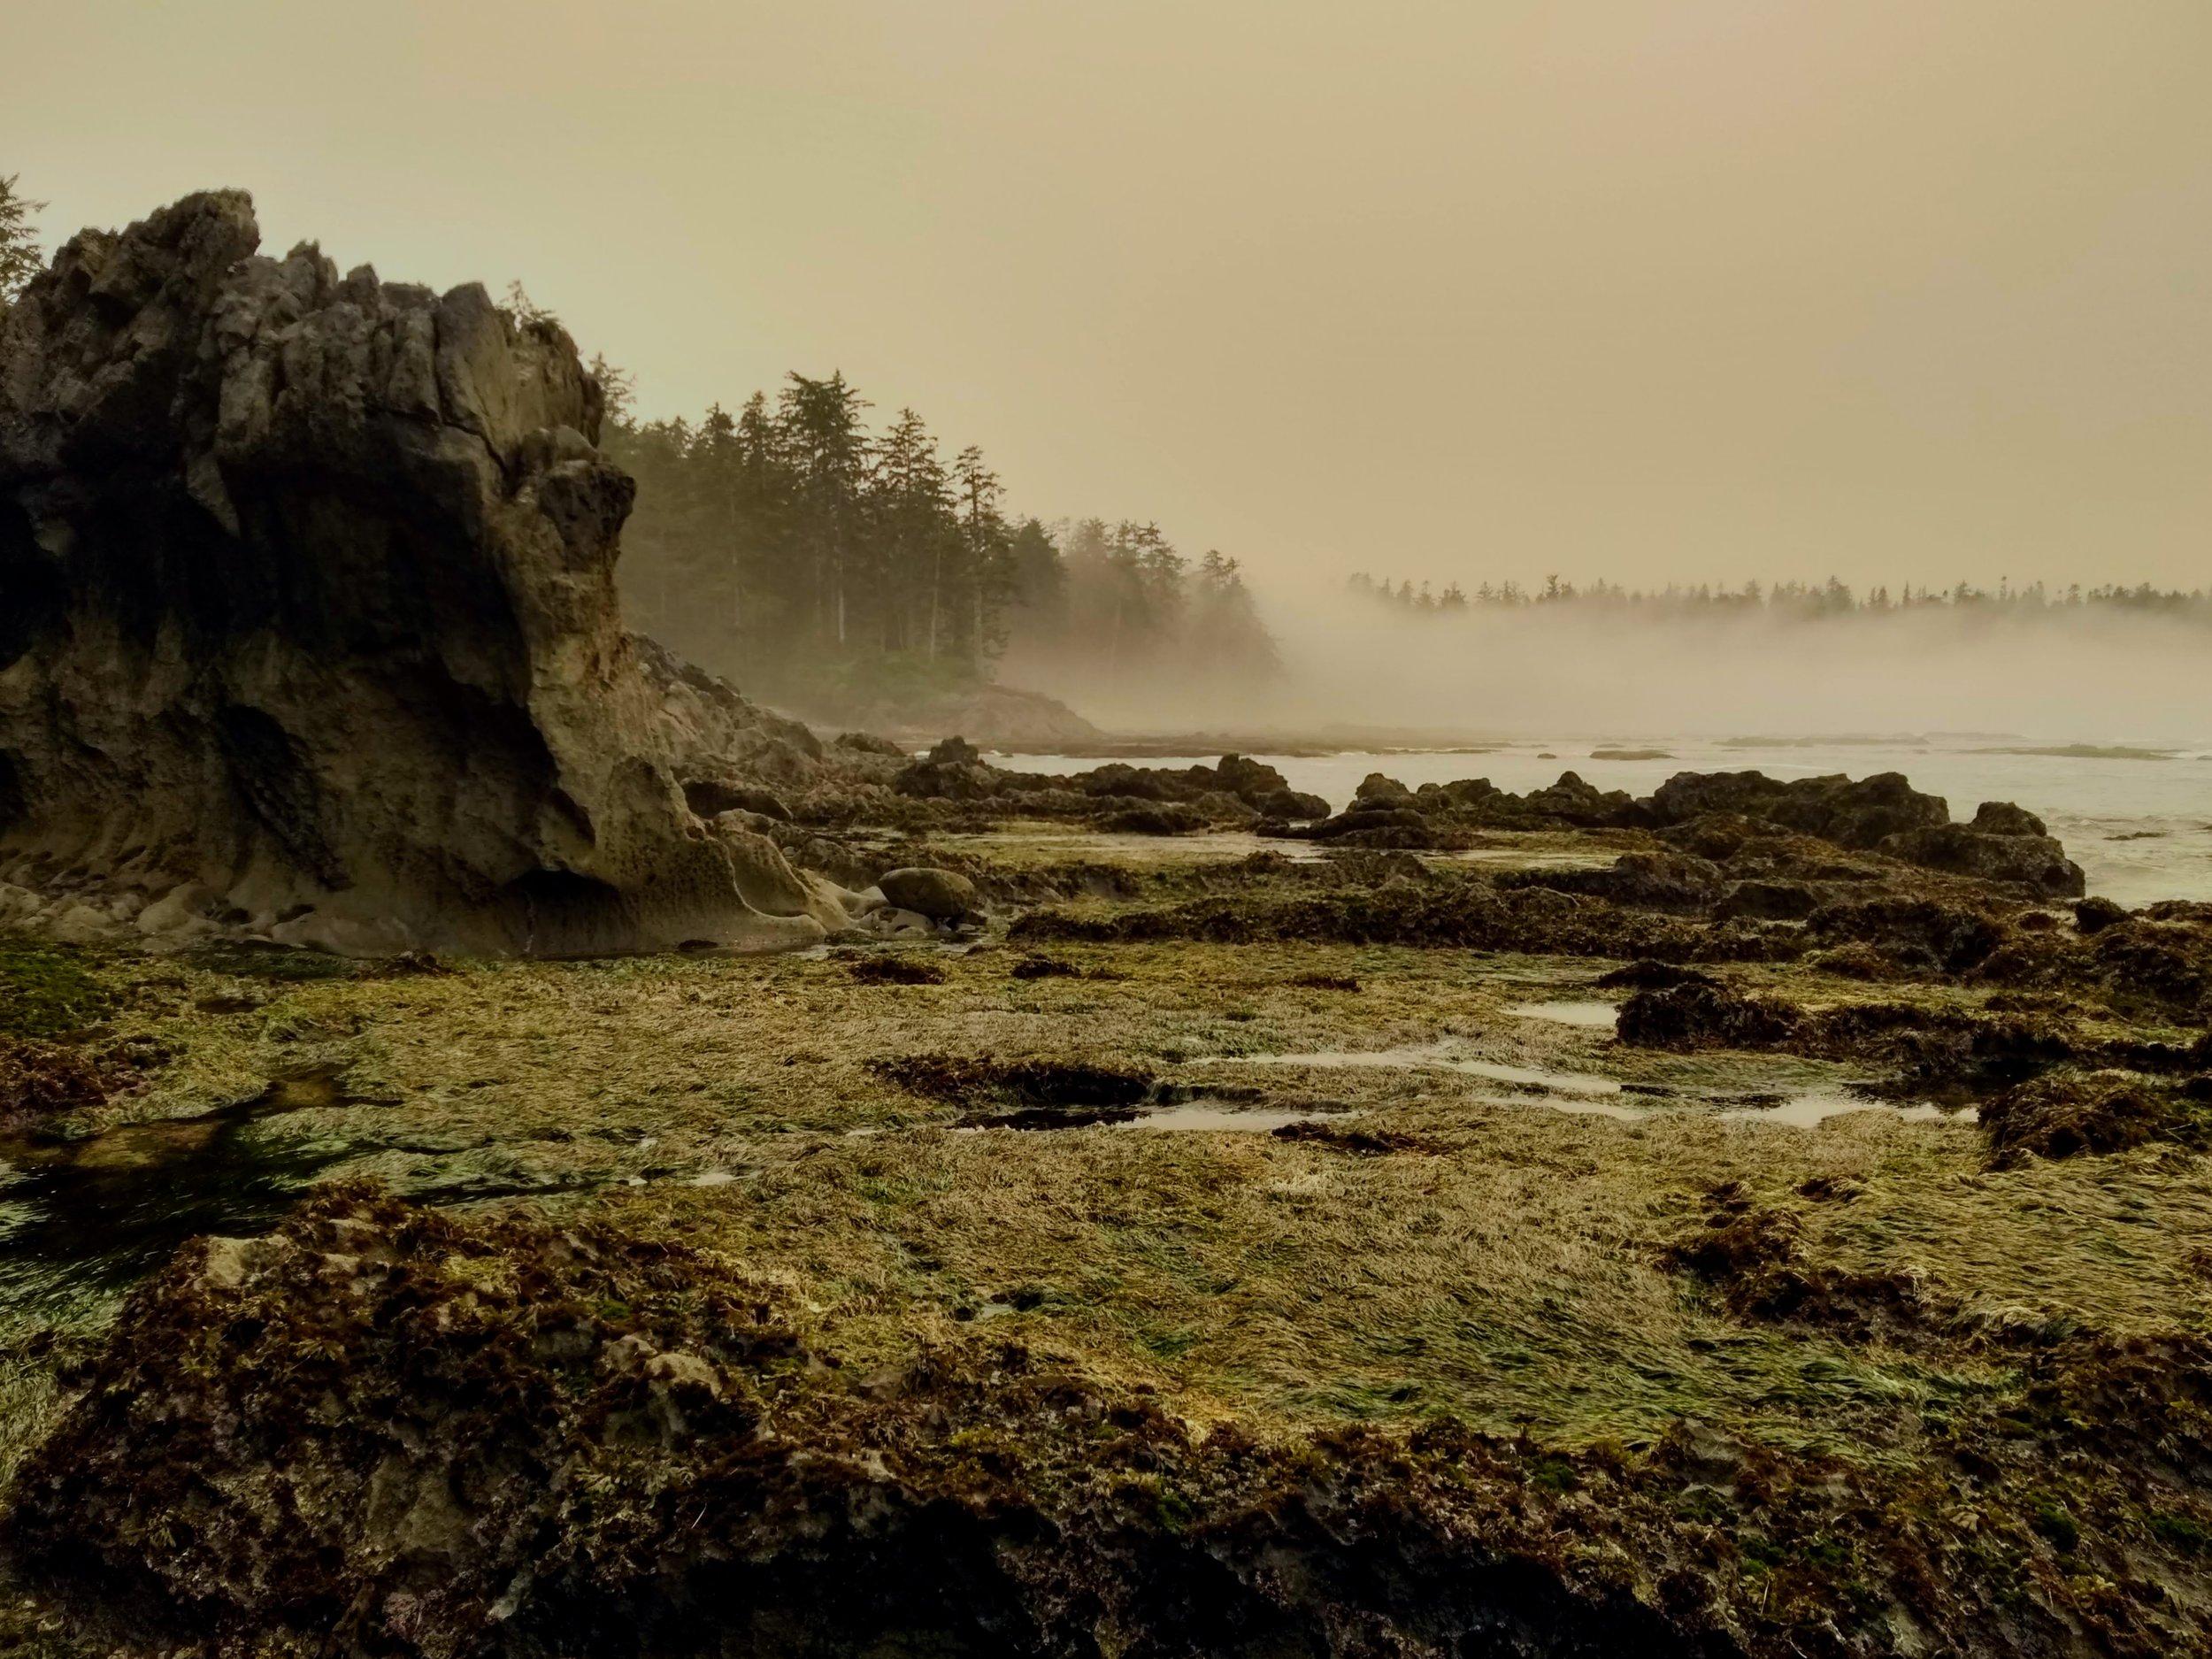 A foggy day on the North Coast Trail